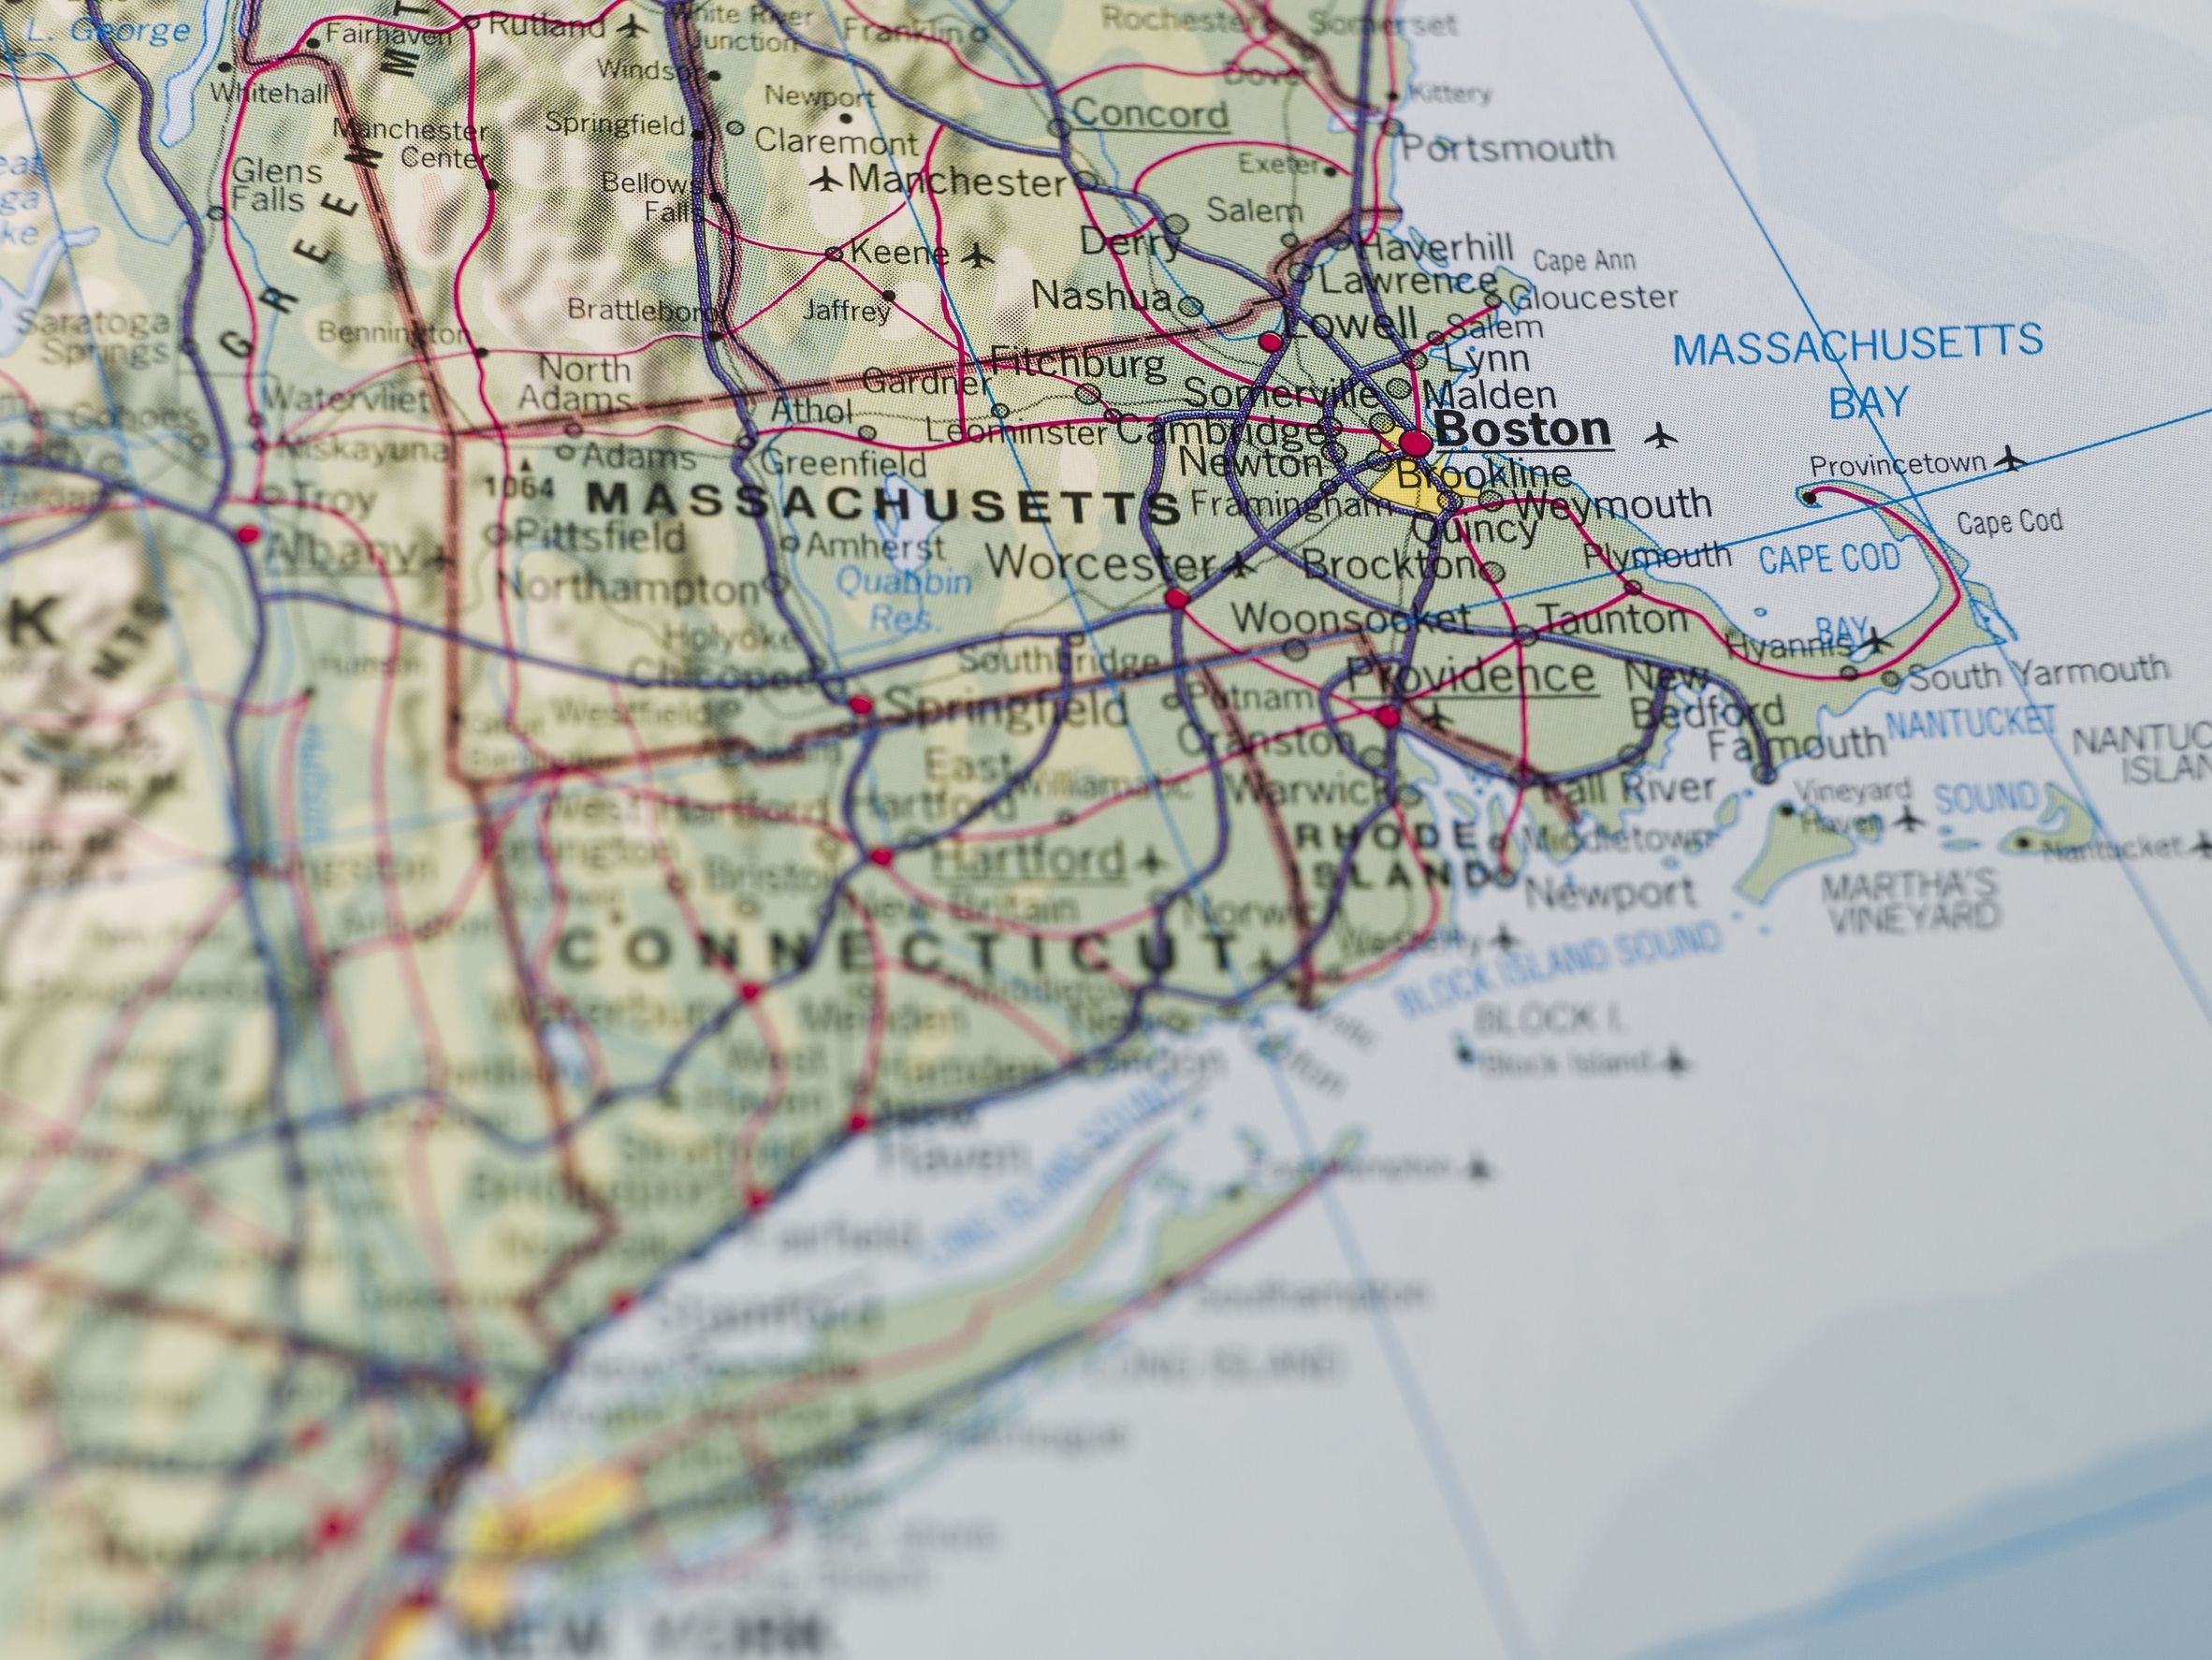 Boston map close up FULL SIZE.jpg